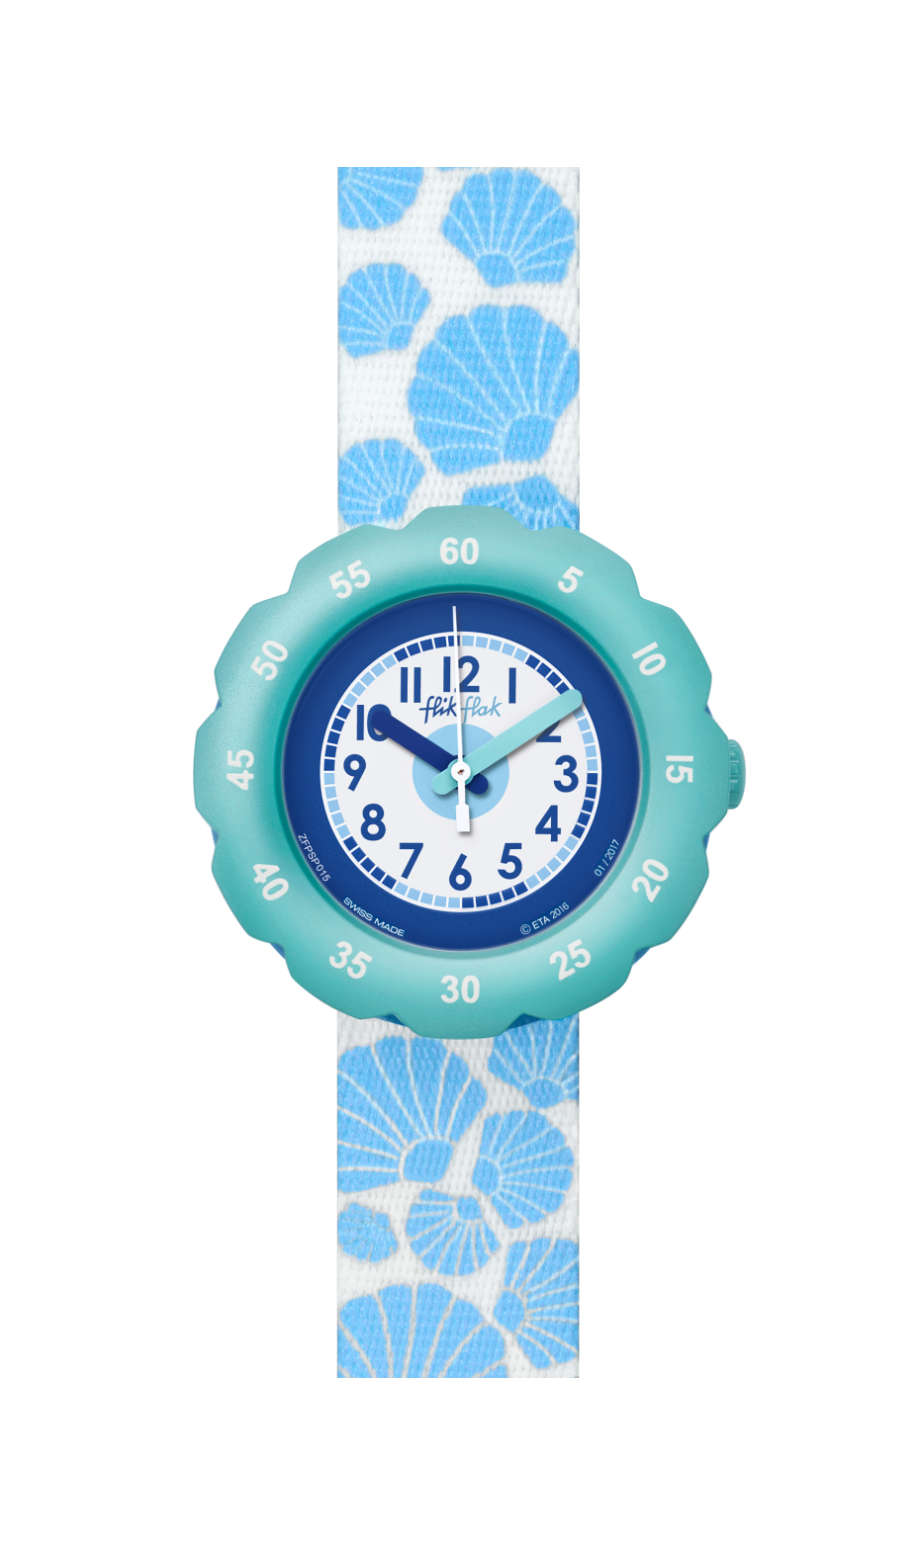 Swatch - SOFT BLUE - 1